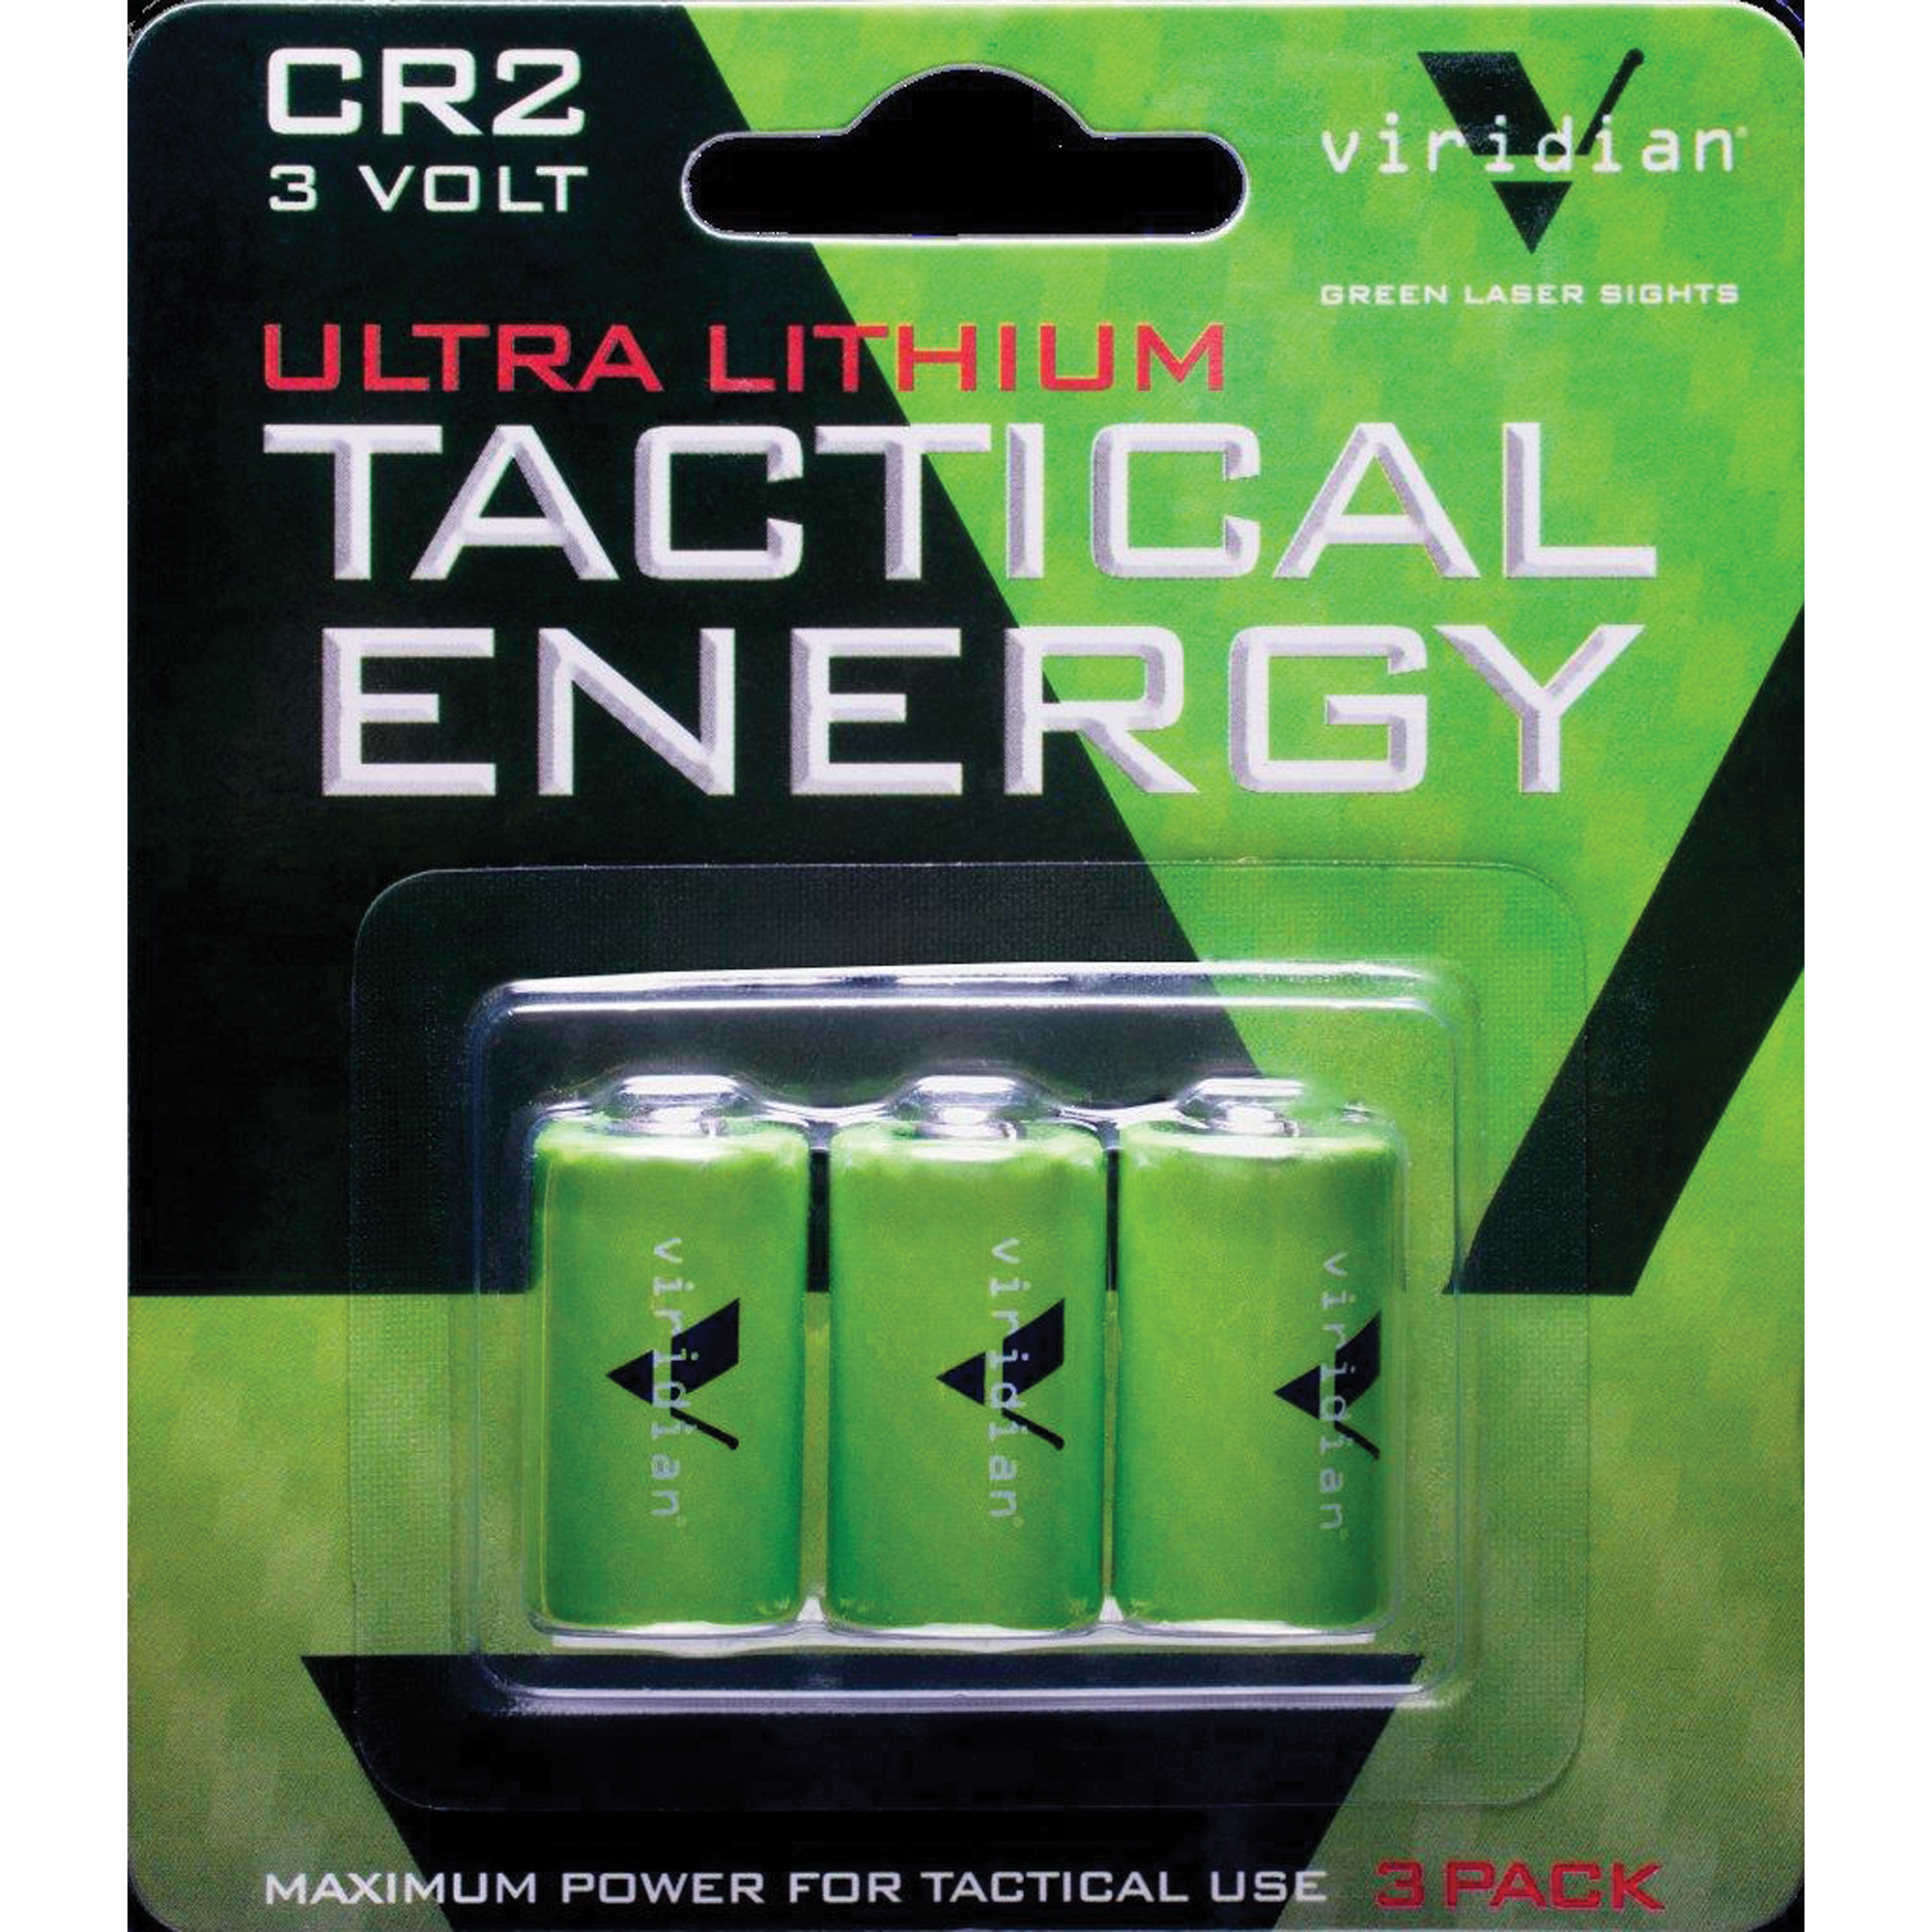 Viridian Cr2 Lith Battery 3-pk